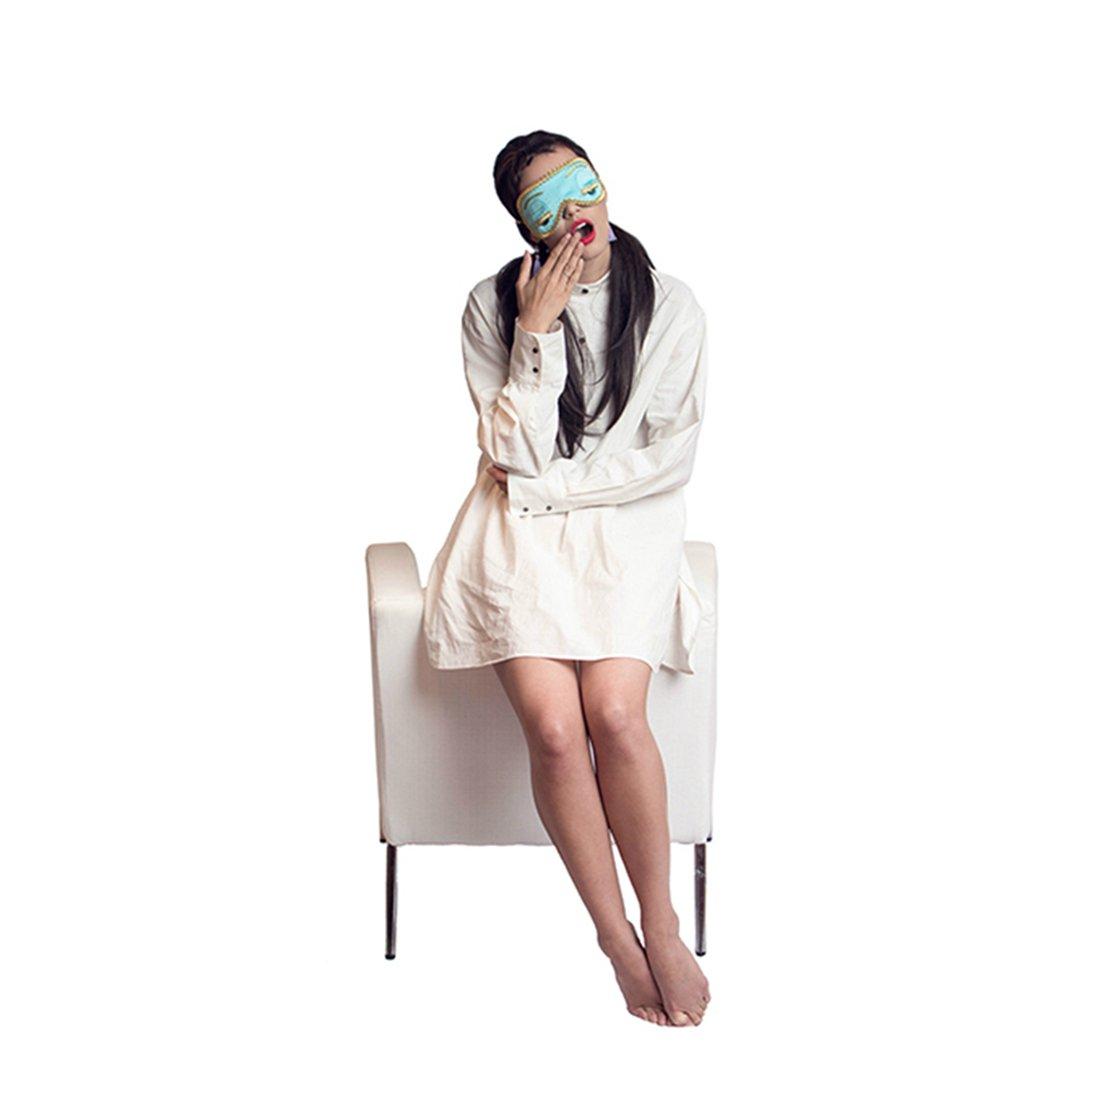 Sleep Set, Audrey Hepburn Breakfast at Tiffanys, Sleep Mask, Ear Plugs and Shirt (original with gift box)